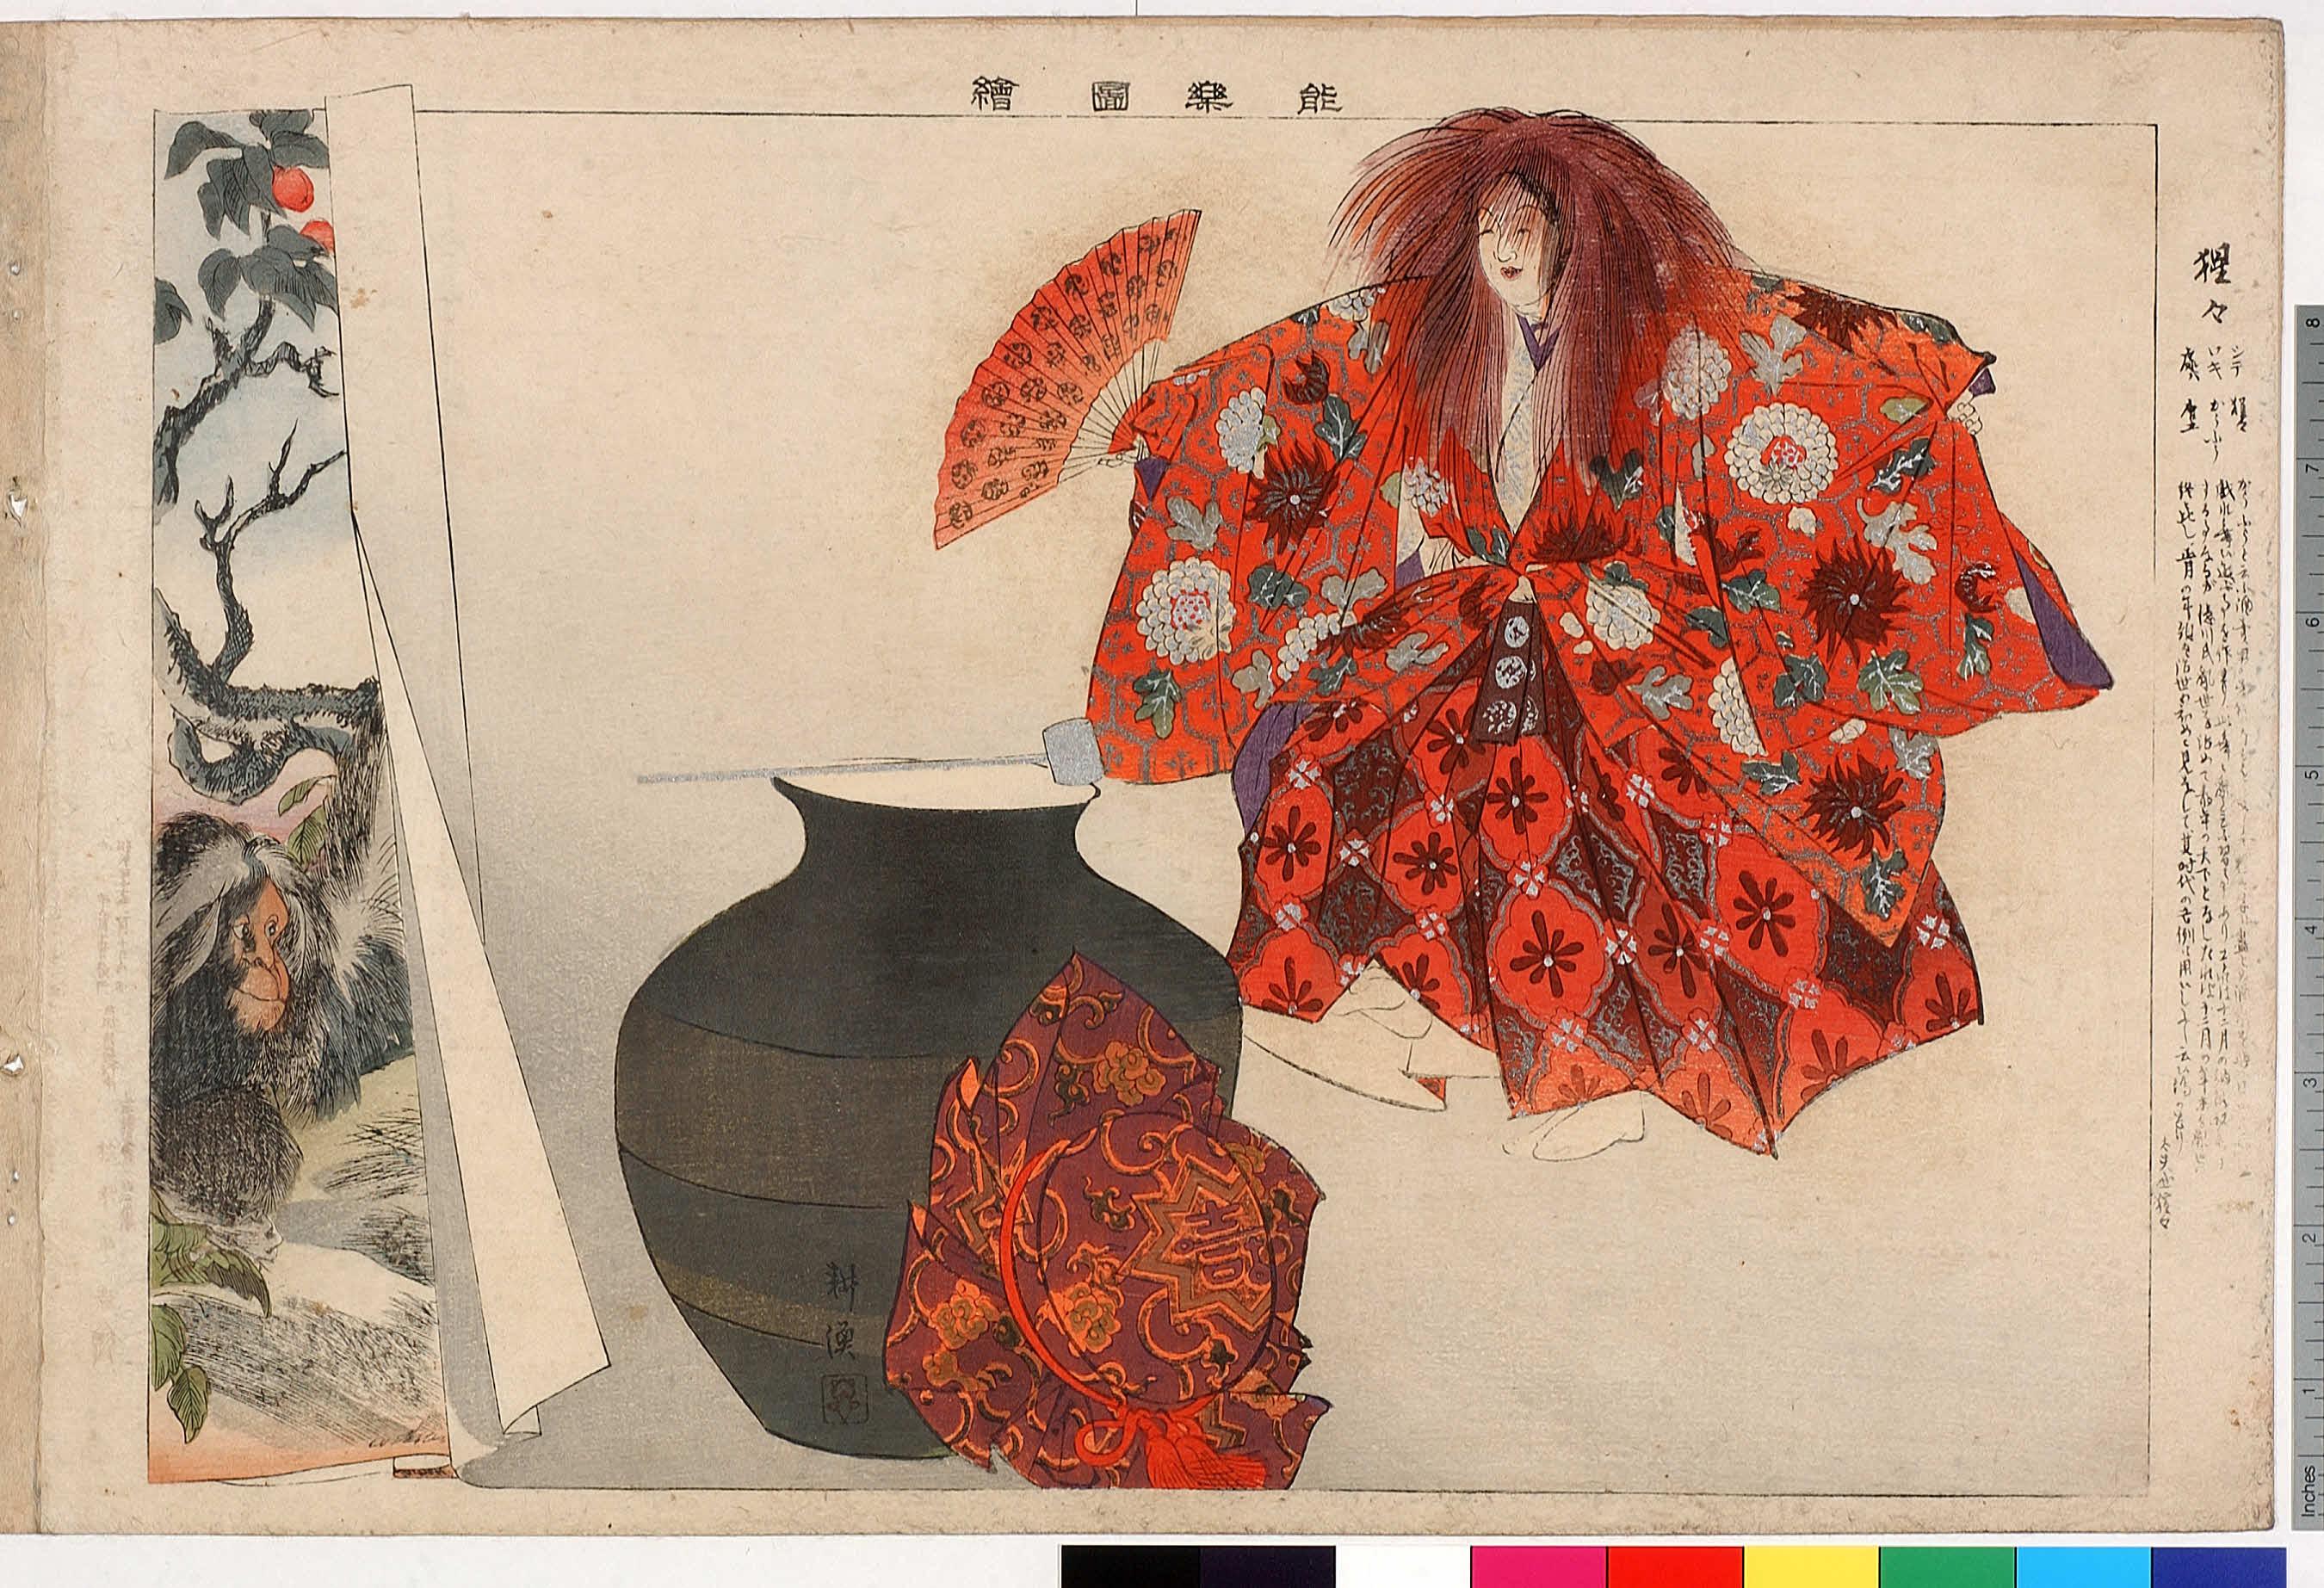 https://data.ukiyo-e.org/ritsumei/images/arcUP0943.jpg